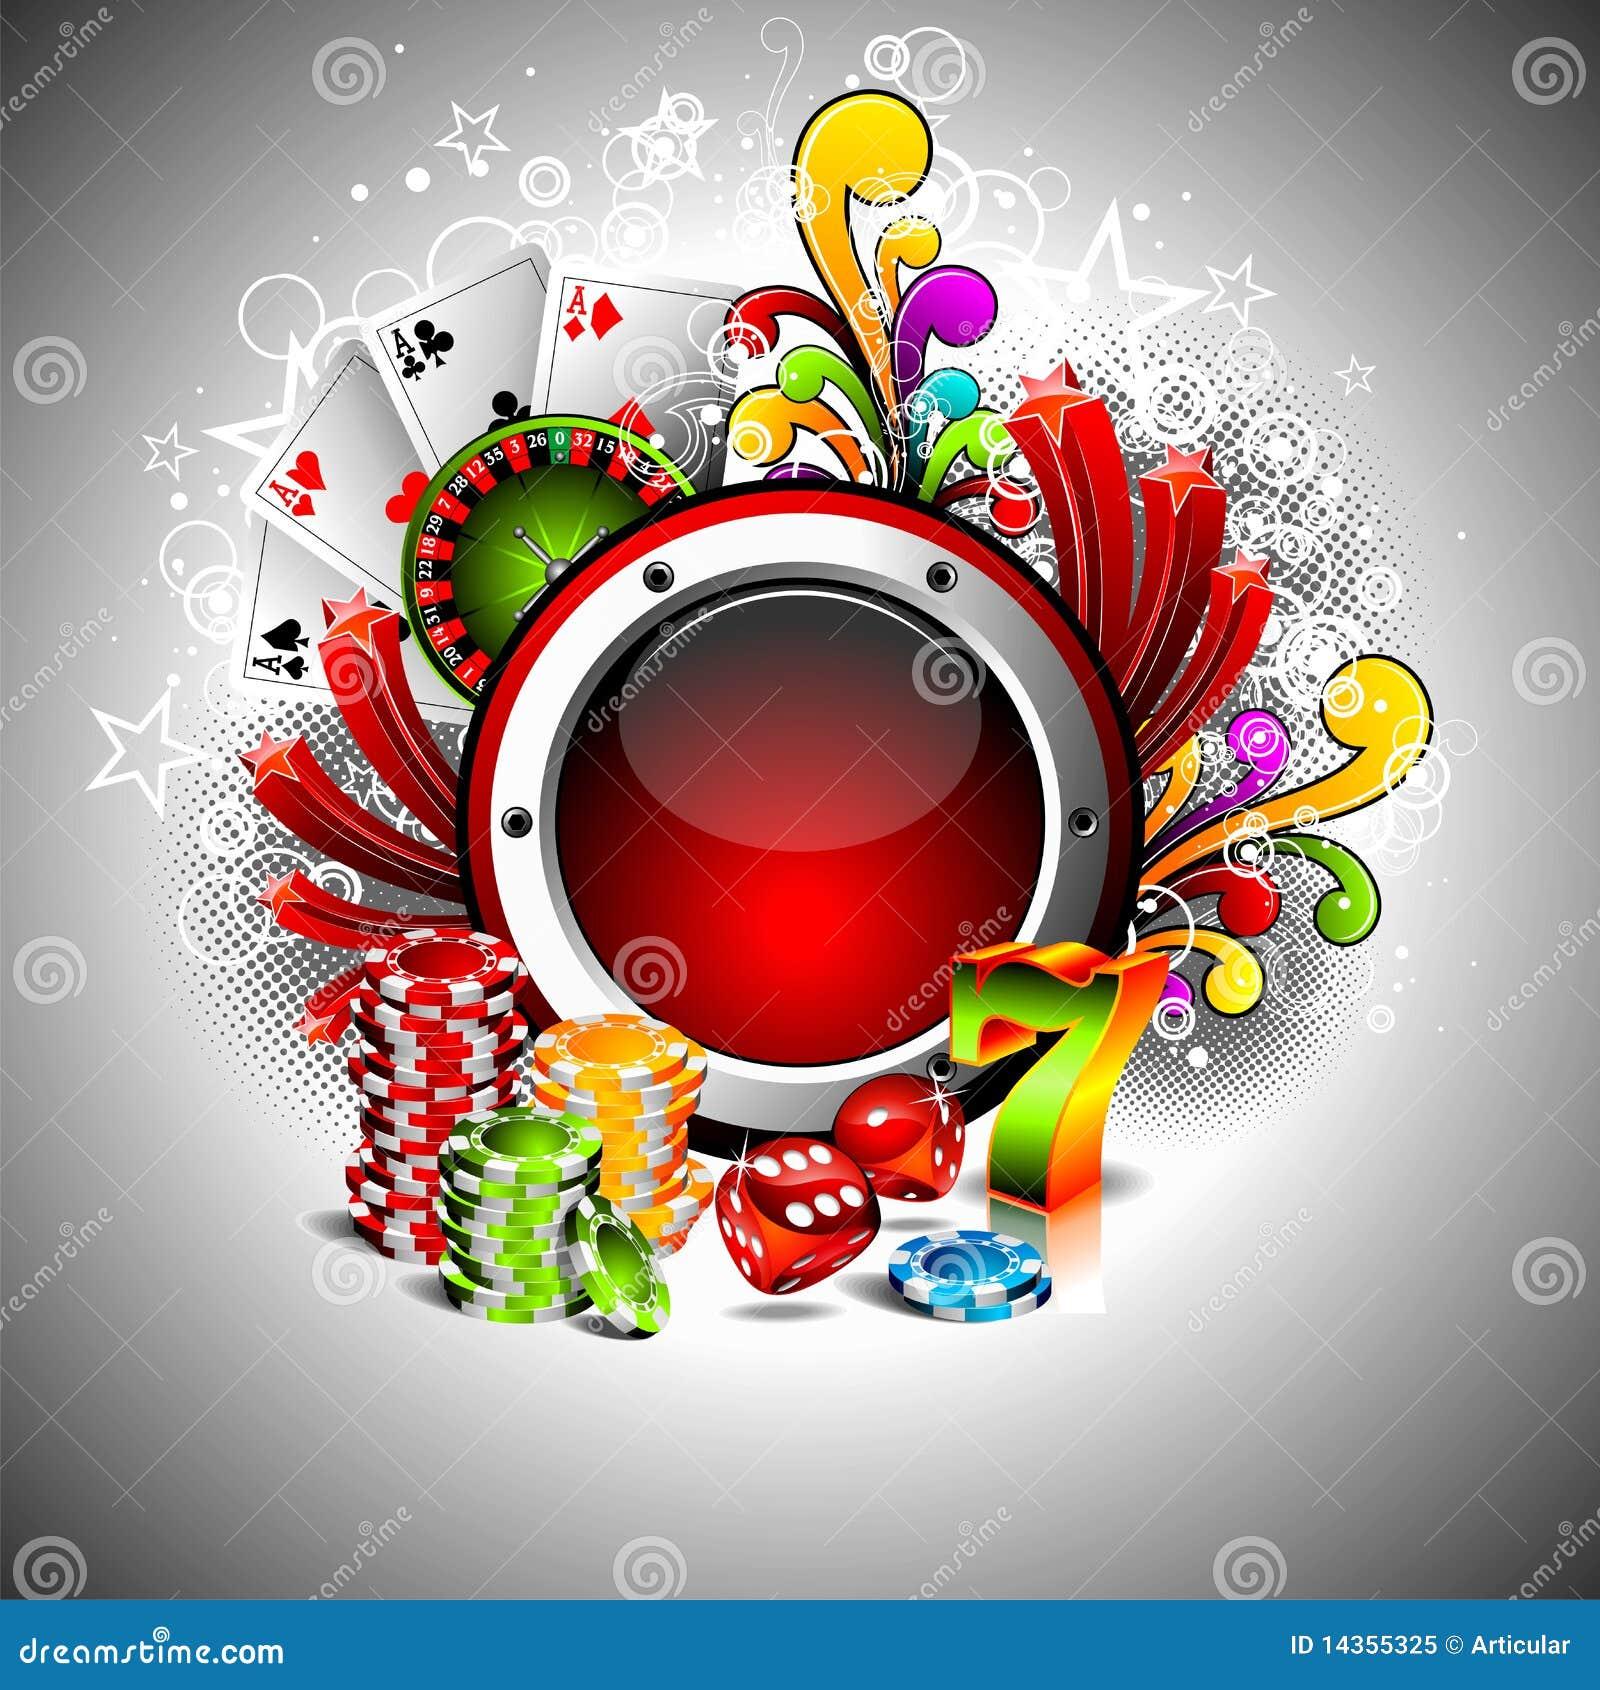 Gambling images royalty free